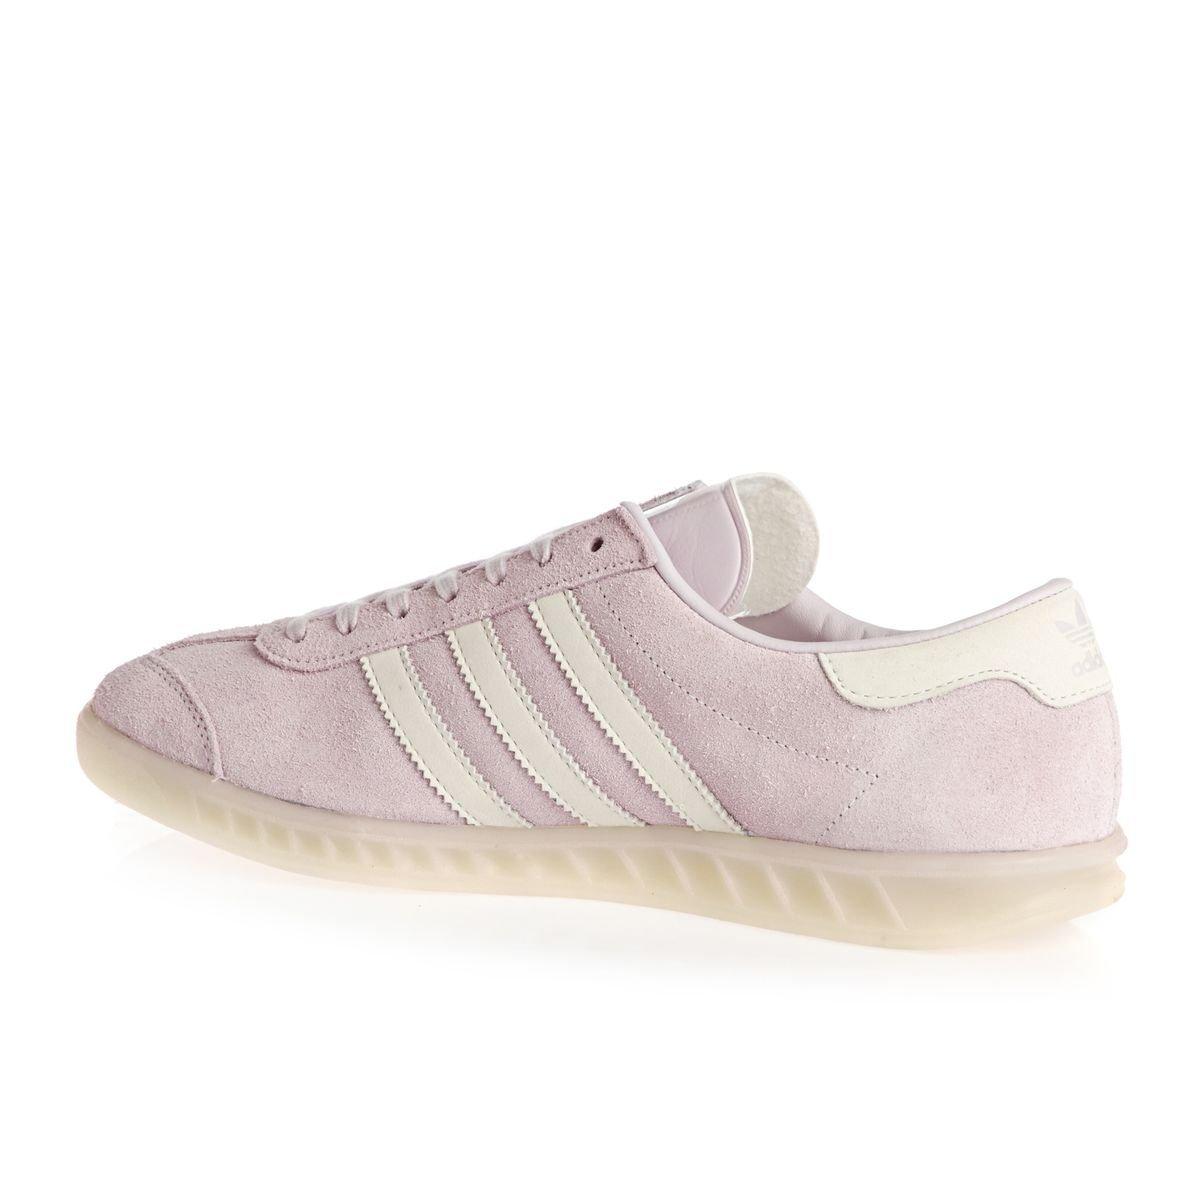 new concept 3db0f 80d25 adidas Hamburg W Ice Purple White White 41 Amazon.co.uk Shoe